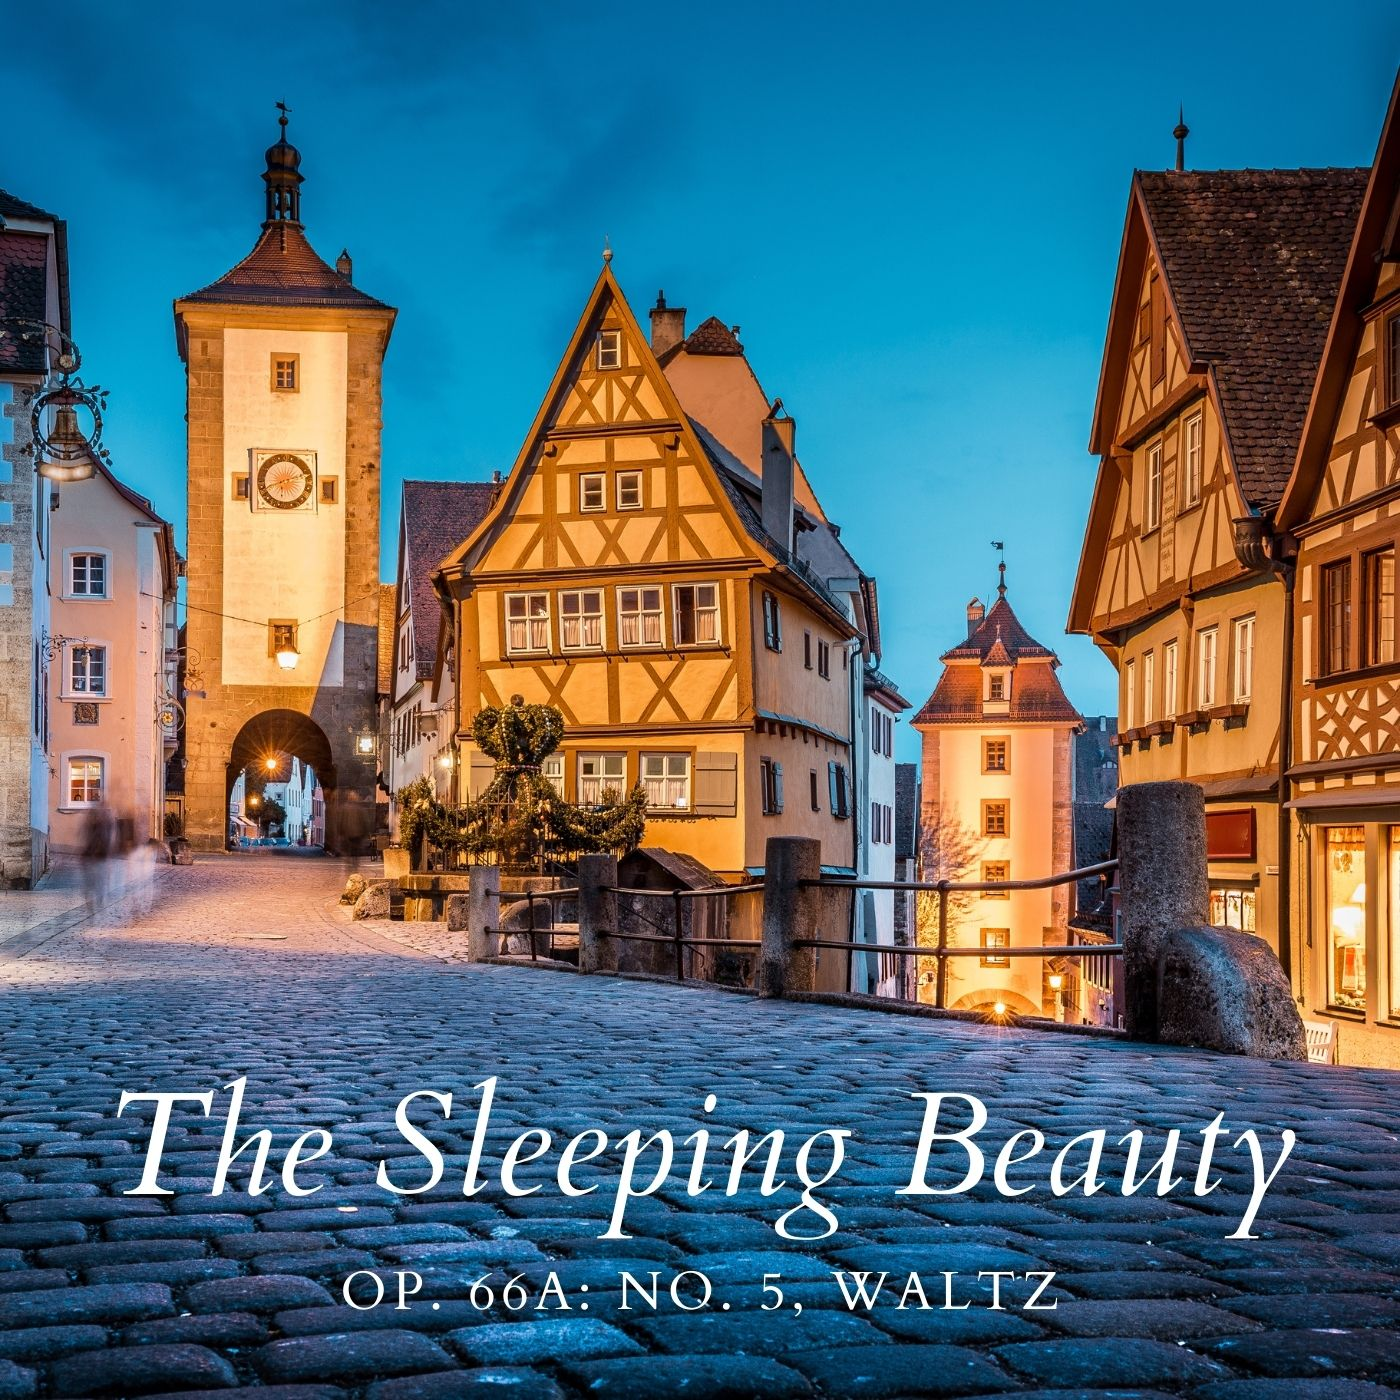 The Sleeping Beauty, Op. 66a: No. 5, Waltz